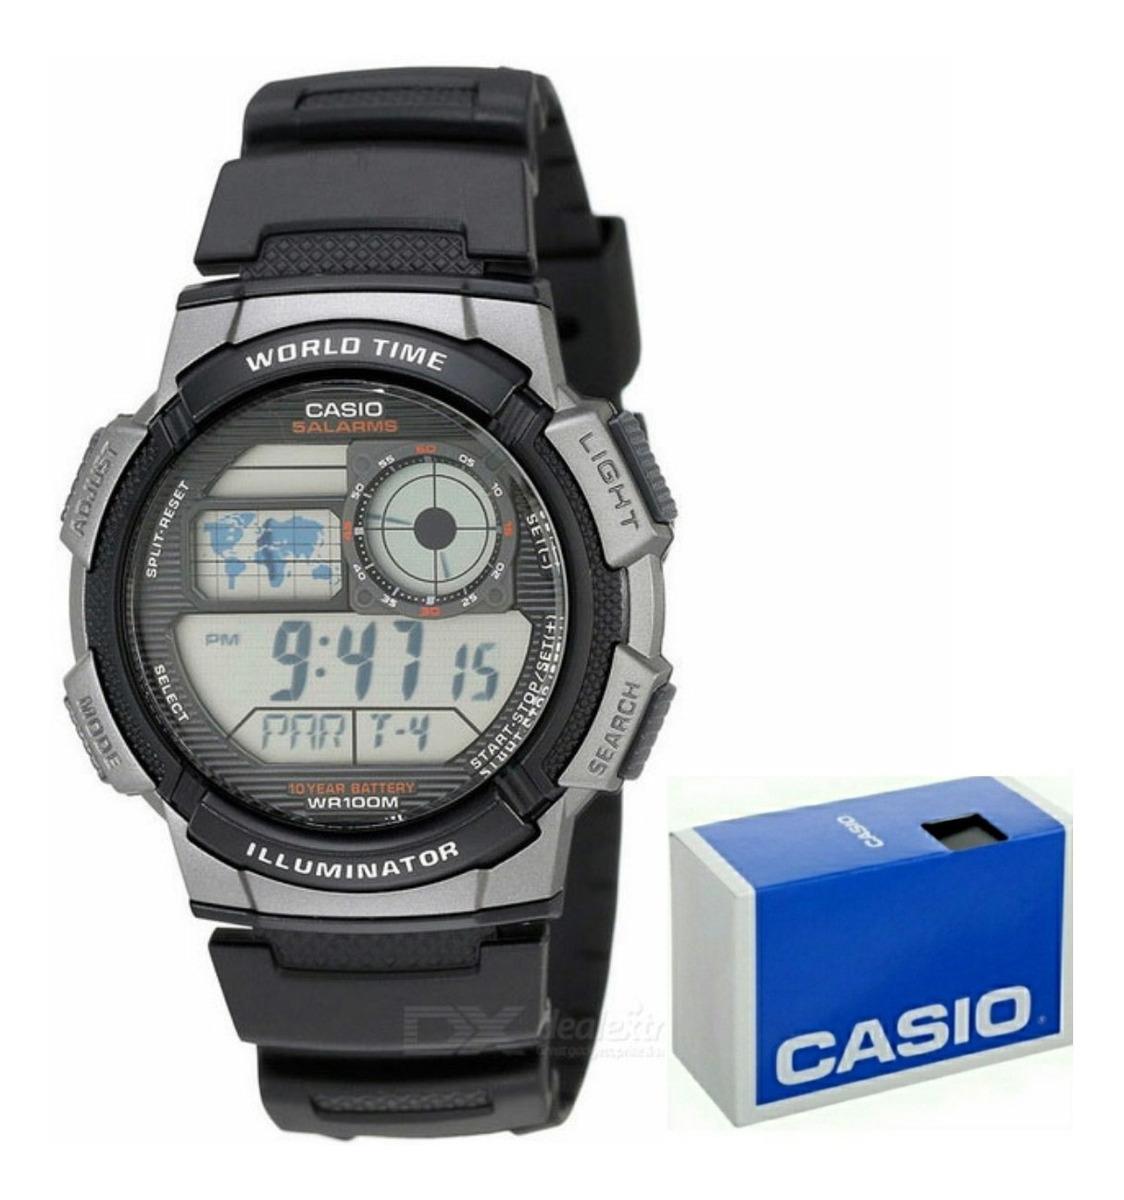 Reloj Casio Hora Alarmas Temporizador 5 Ae1000 Mundial Crono 8wO0Pkn